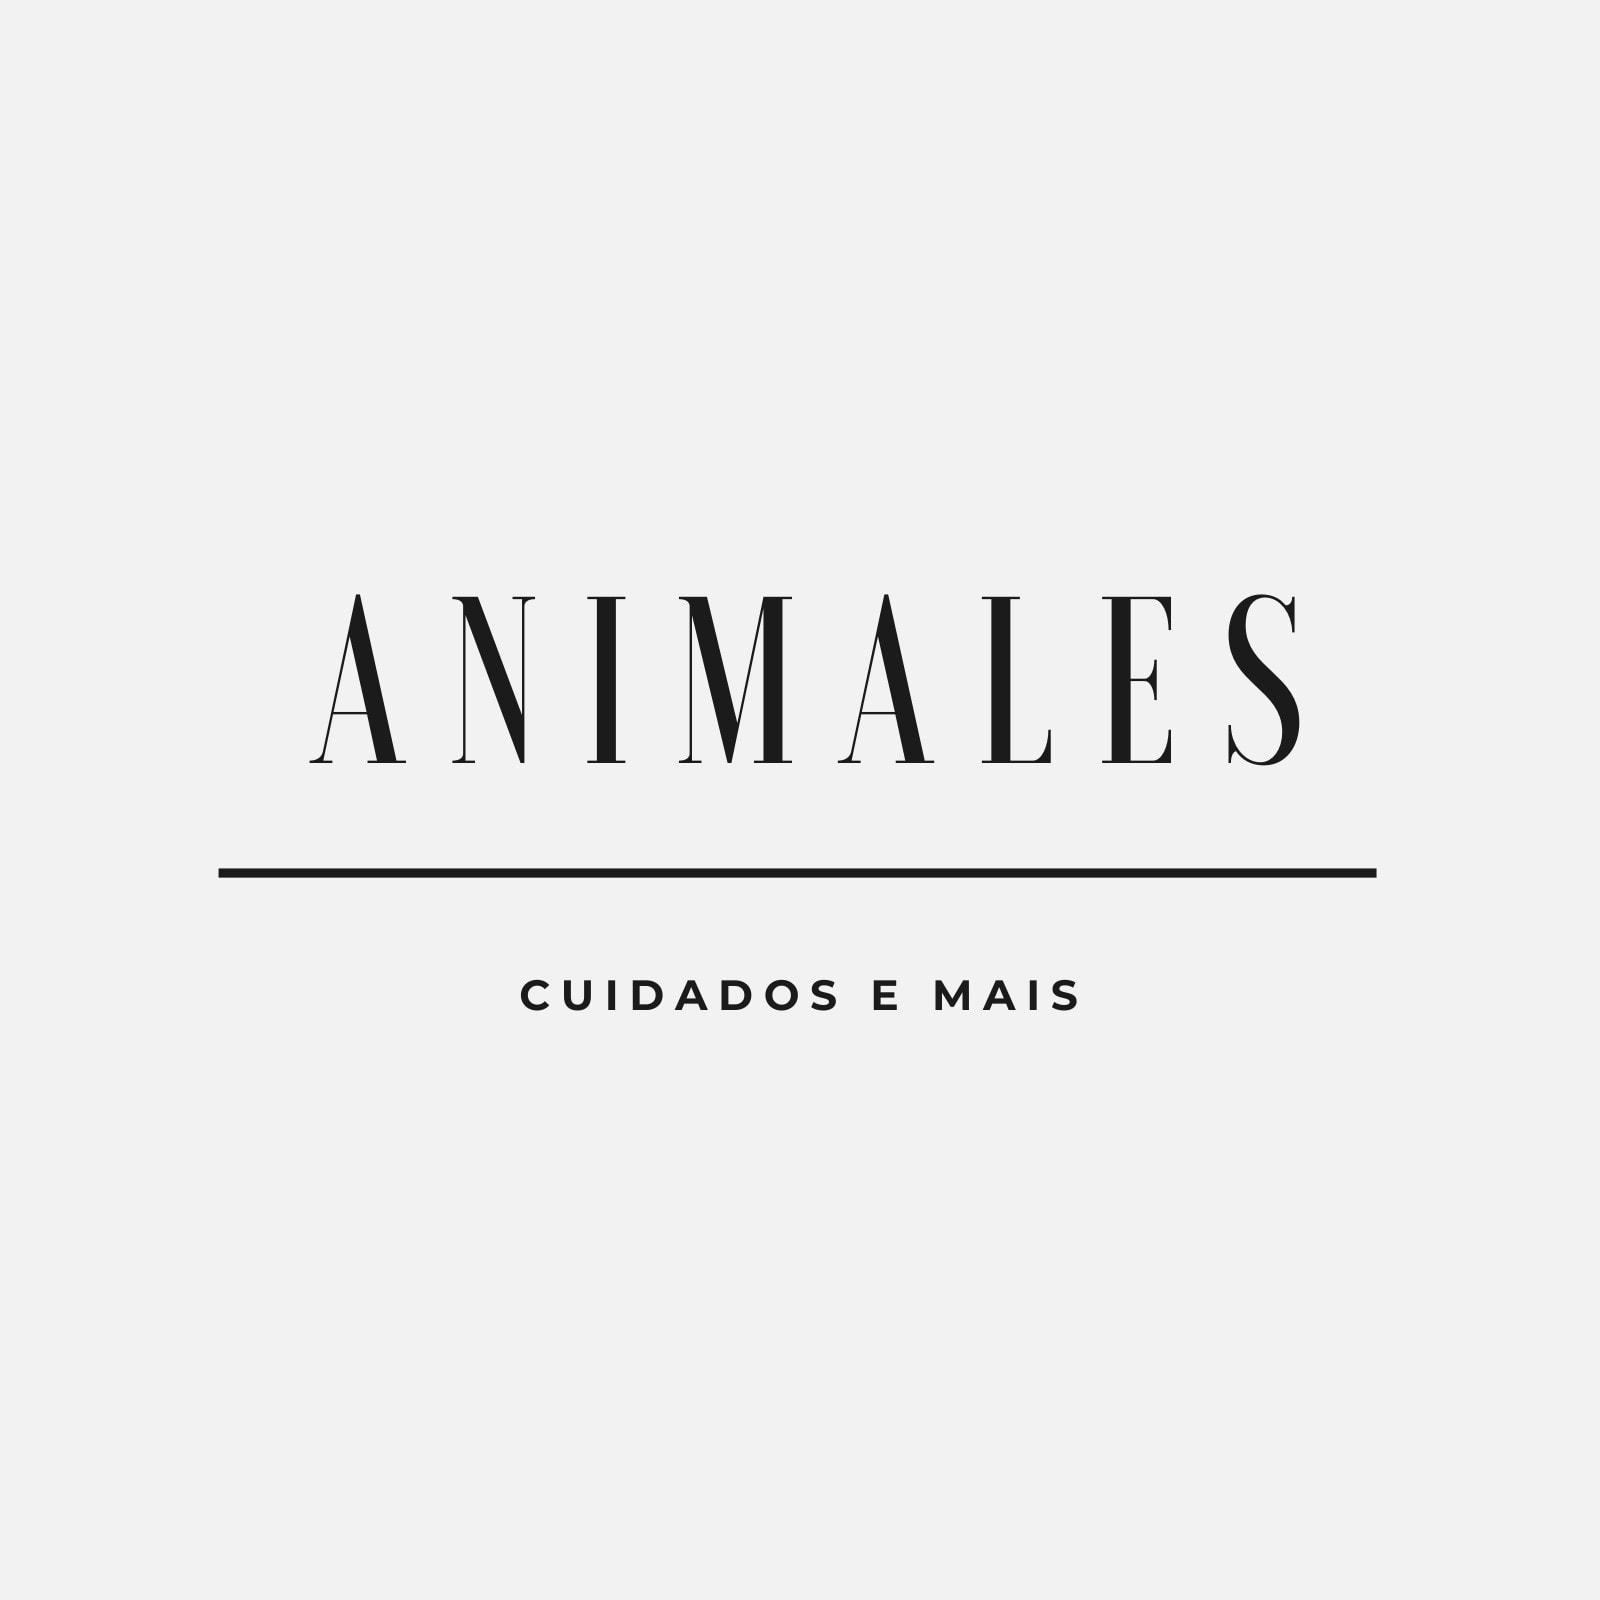 Preto Branco Simples Animais e Pets Logotipo